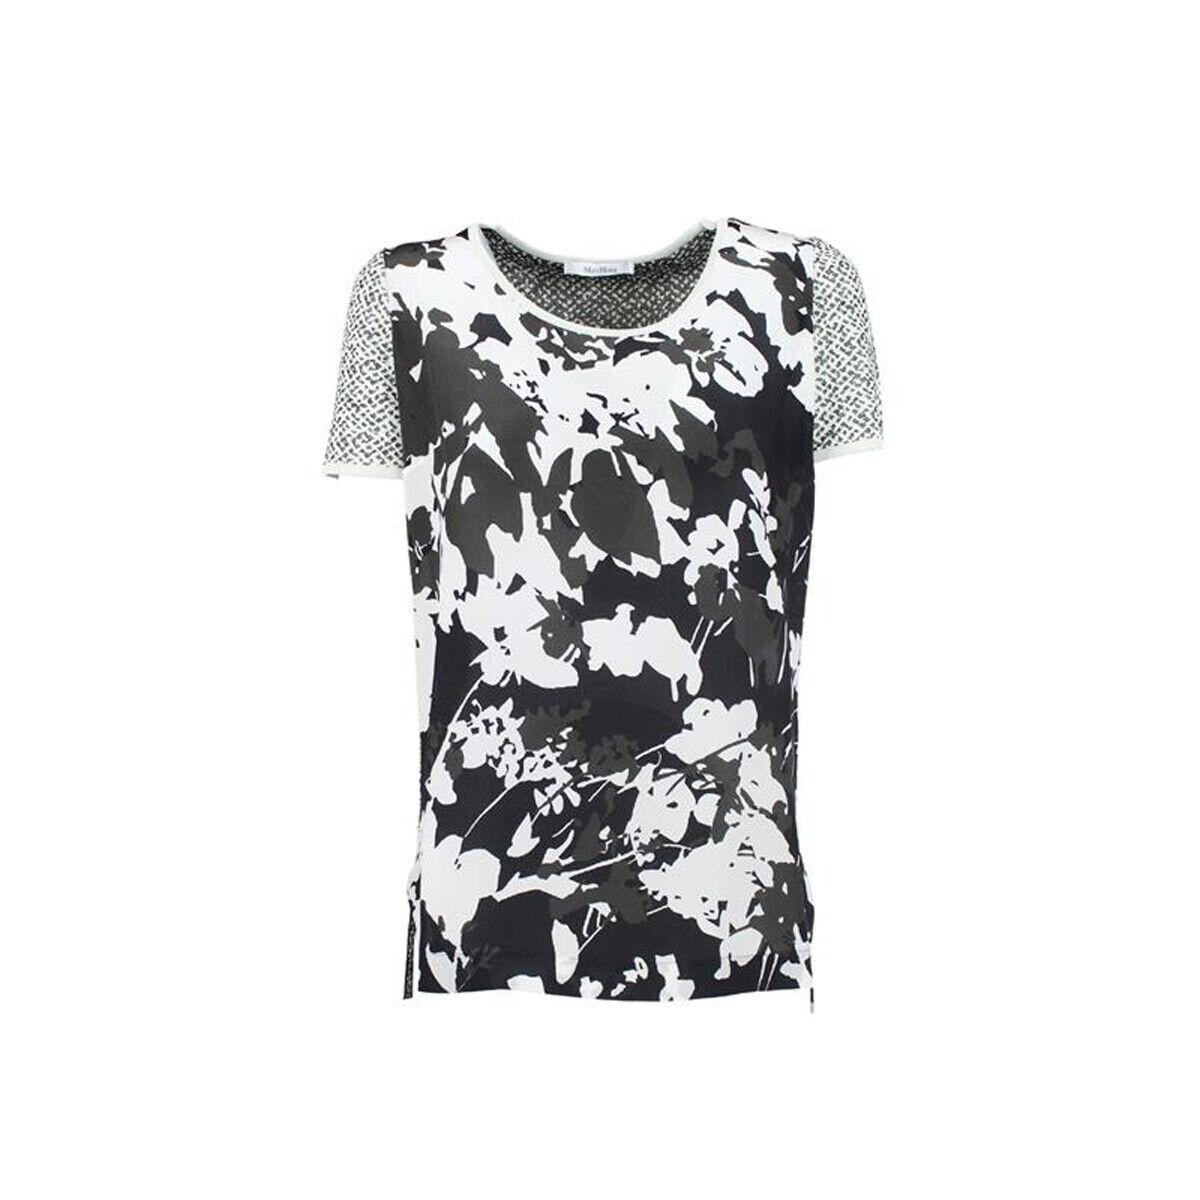 MAX MARA Woherren Vettura Ivory Floral Print Silk Front T-Shirt  NWT